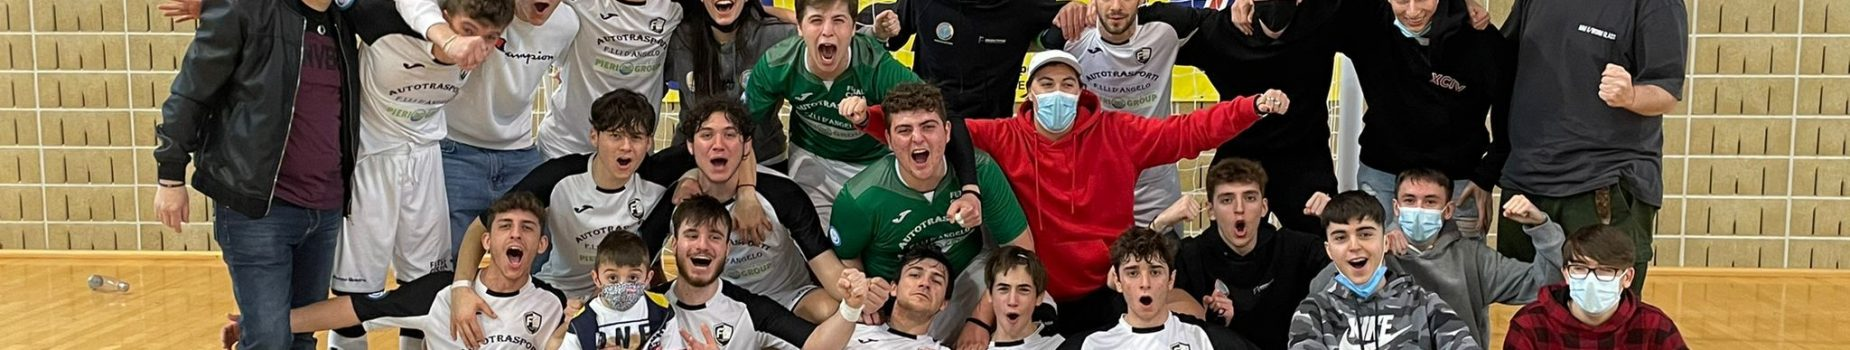 U19: Futsal Cesena-Olimpia Regium 11-2. Primo posto nel girone!